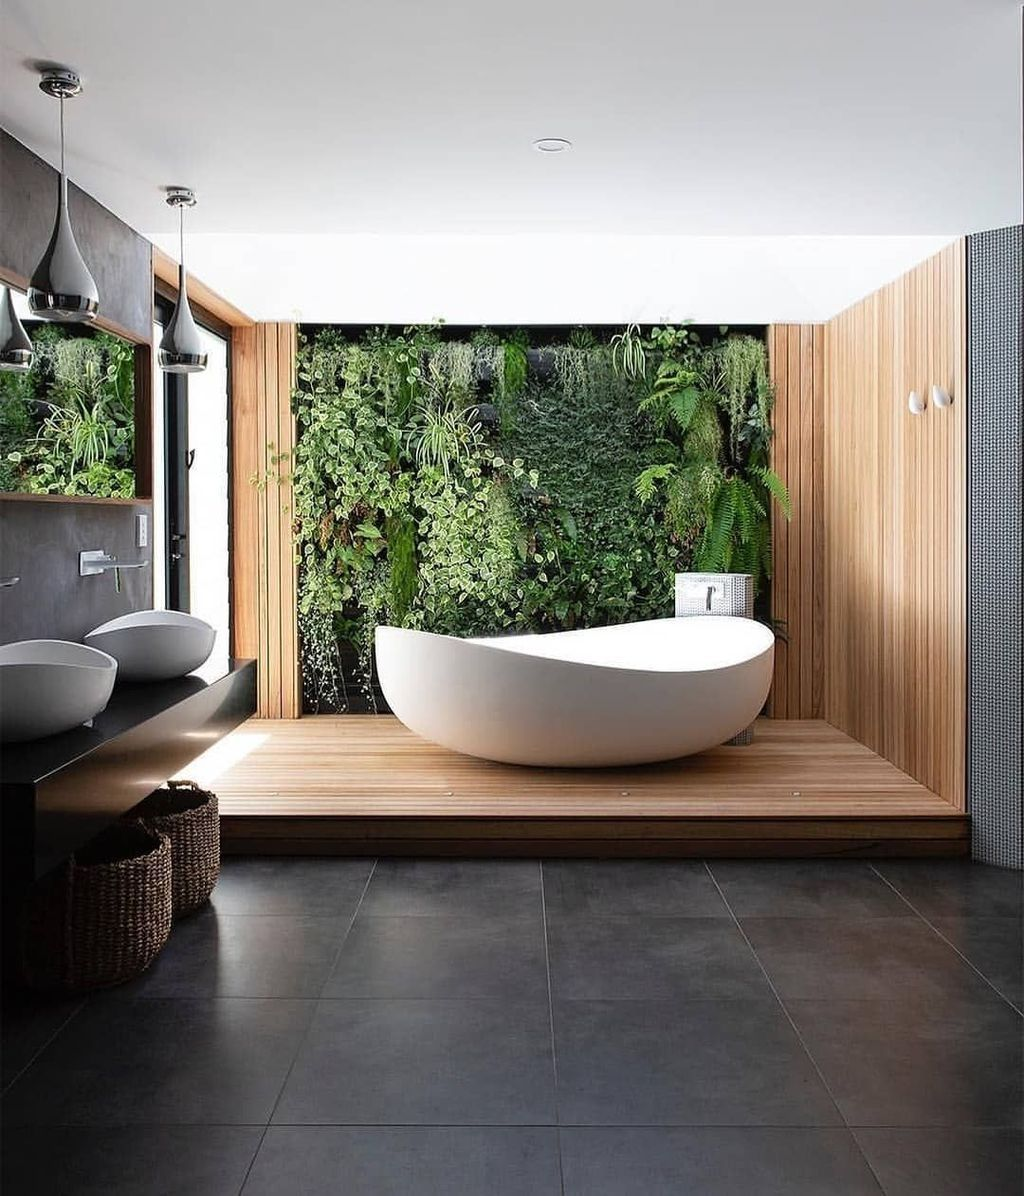 Best-Master-Badezimmer-Dekor-Ideen-zu-versuchen-asap9.jpg 9 9